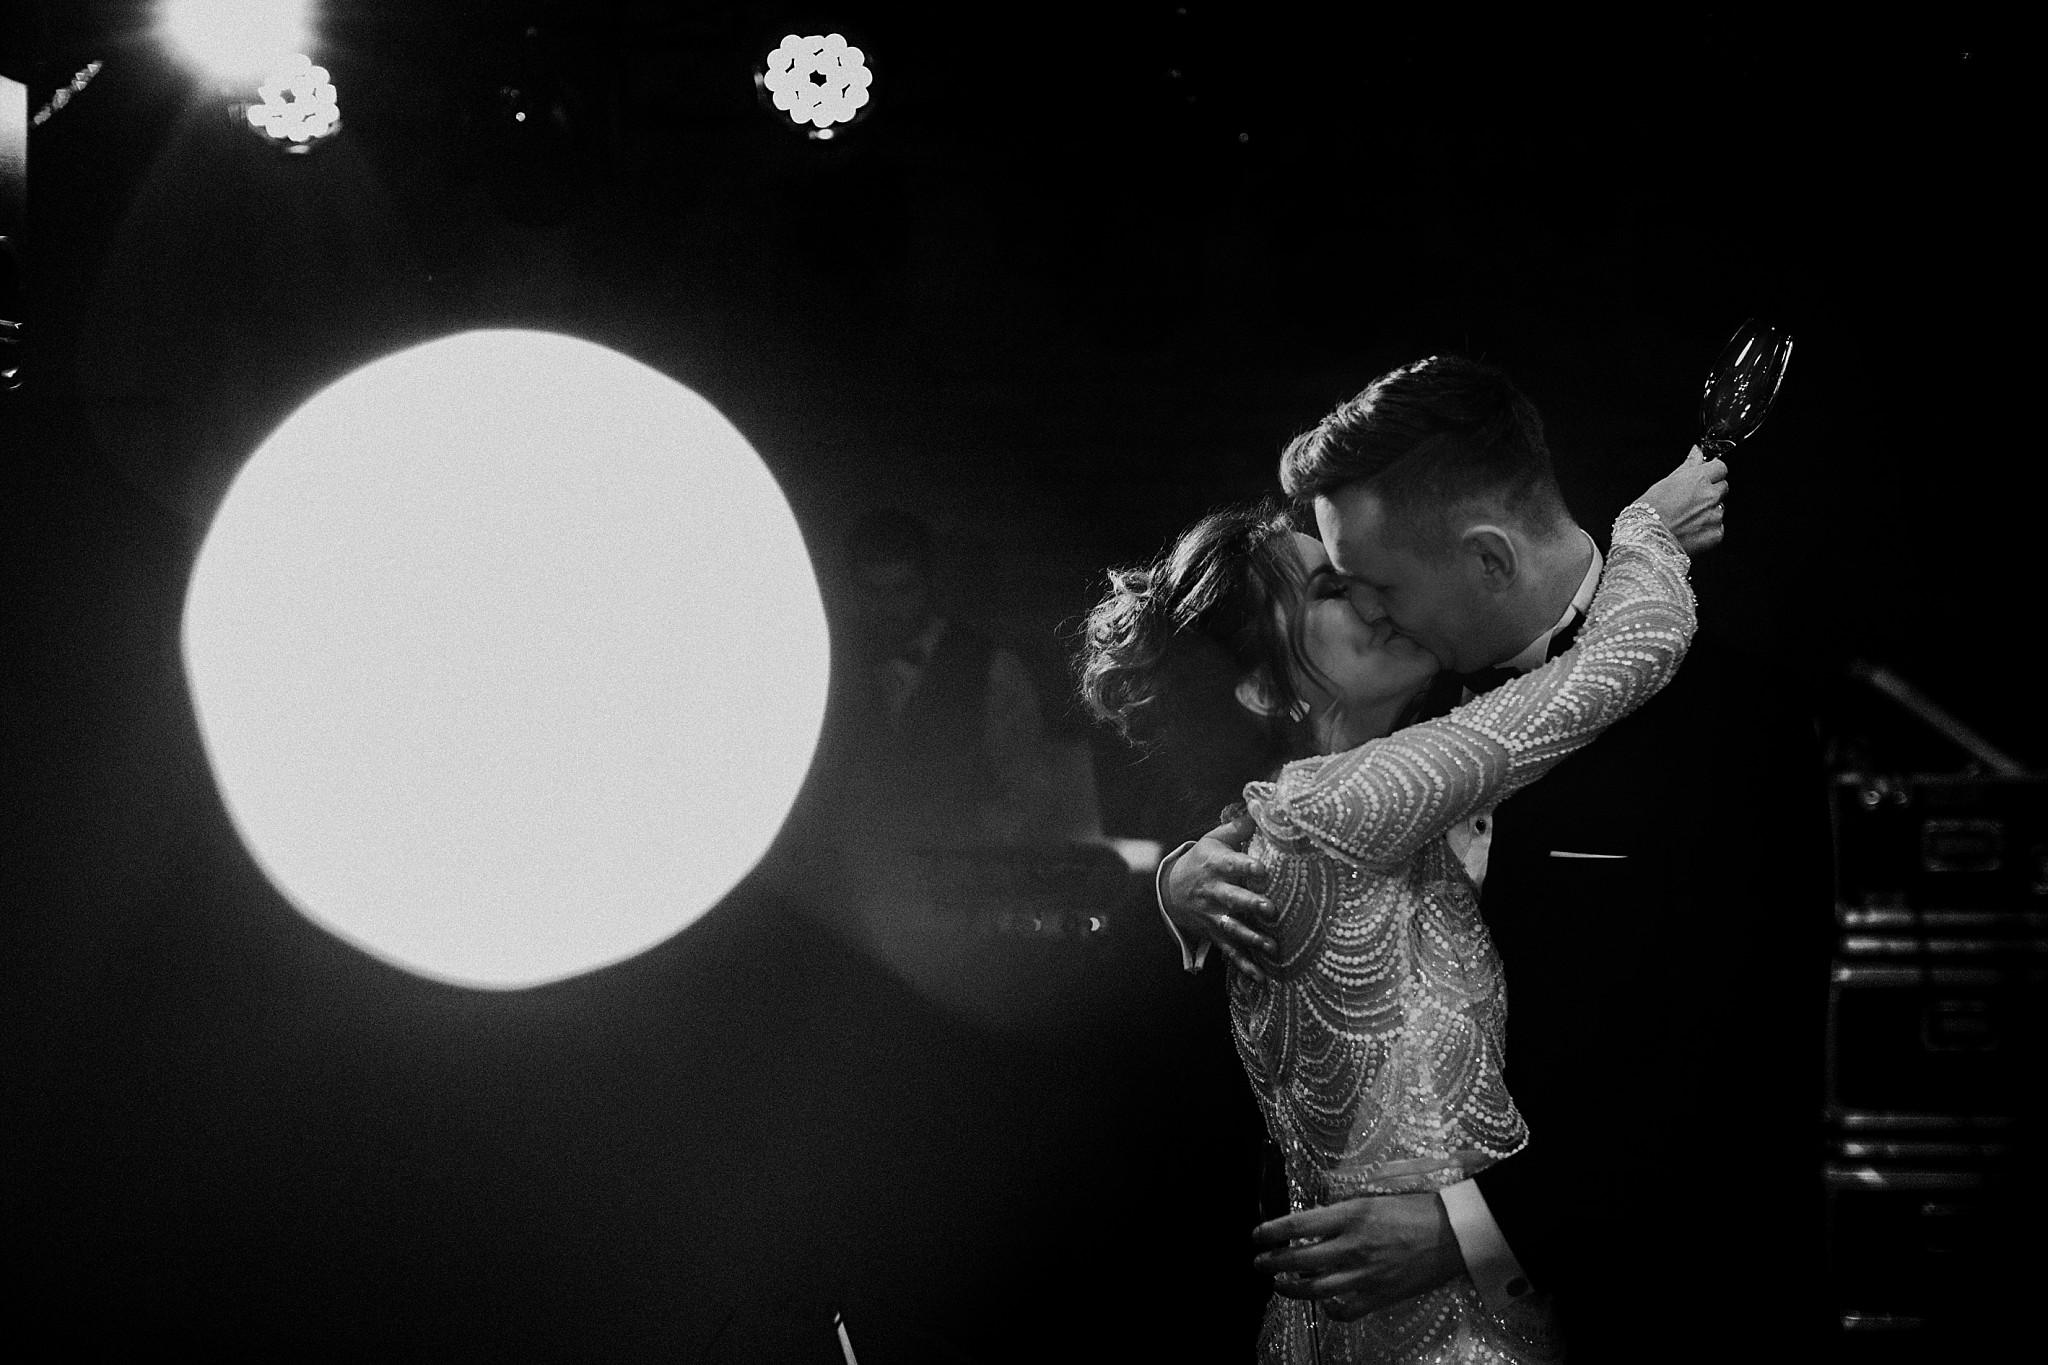 fotograf poznan wesele dobra truskawka piekne wesele pod poznaniem wesele w dobrej truskawce piekna para mloda slub marzen slub koronawirus slub listopad wesele koronawirus 296